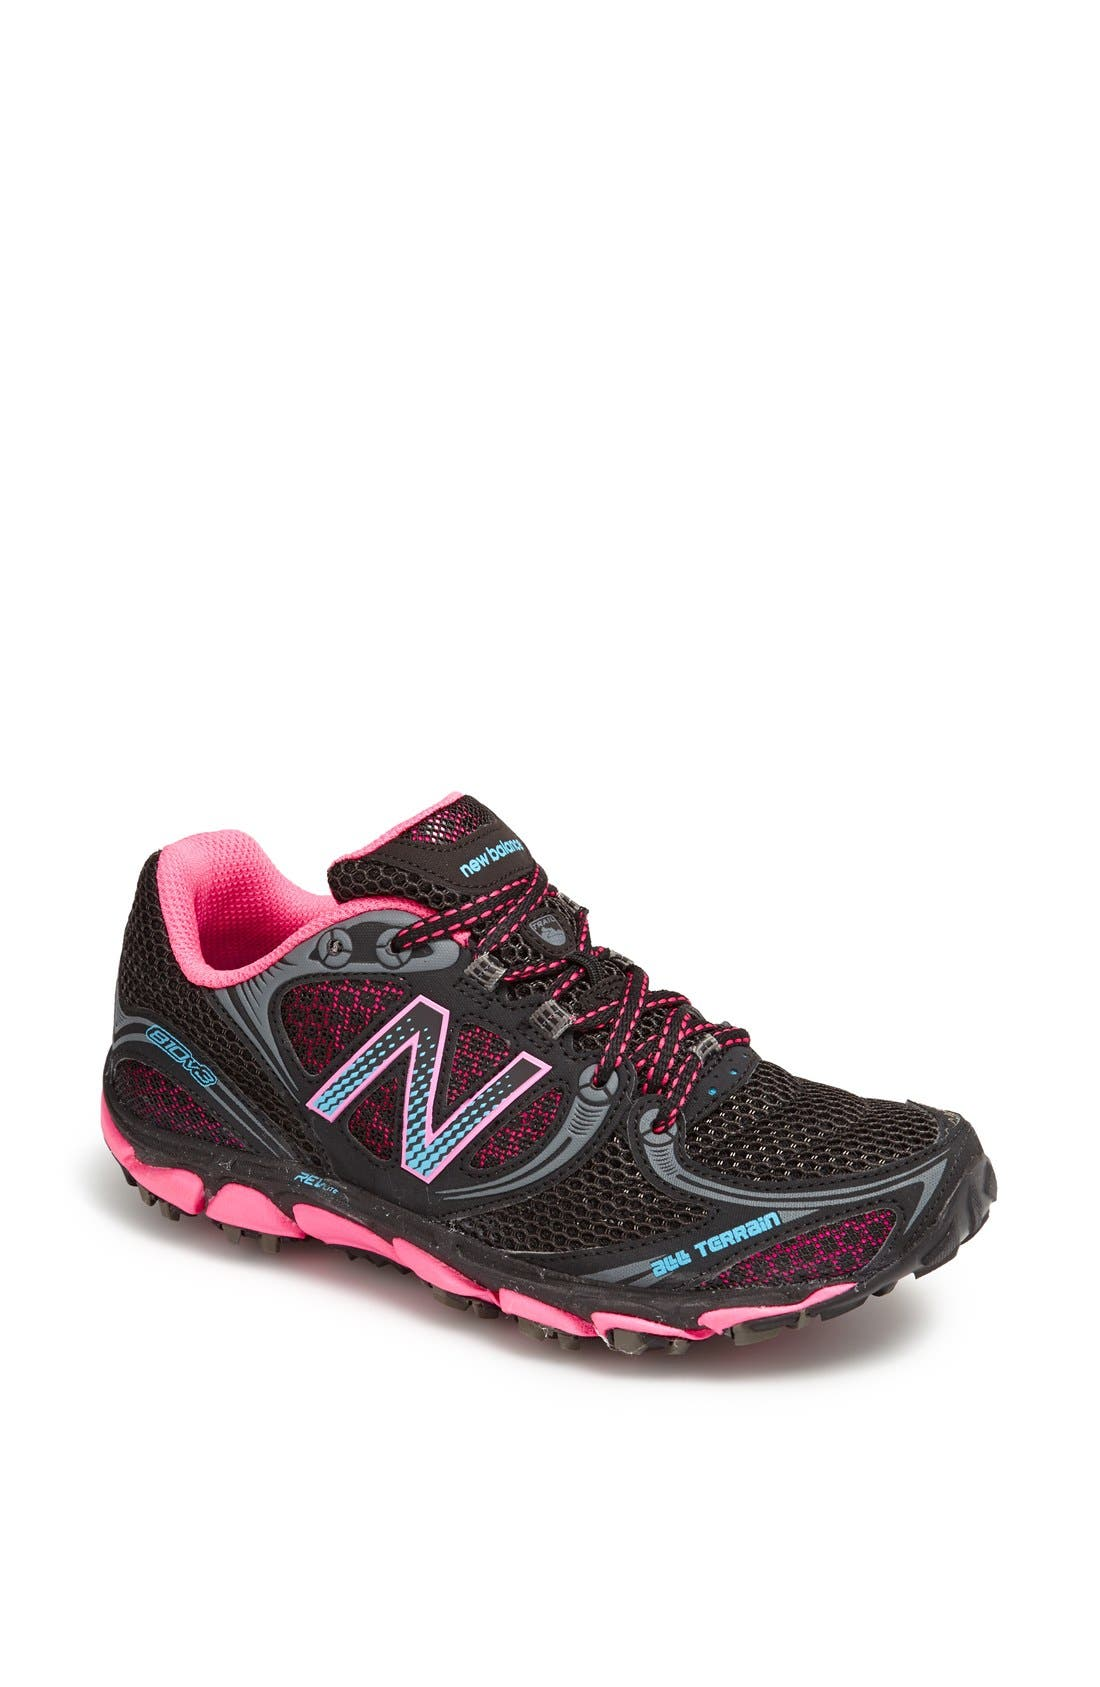 Alternate Image 1 Selected - New Balance '810' Trail Running Shoe